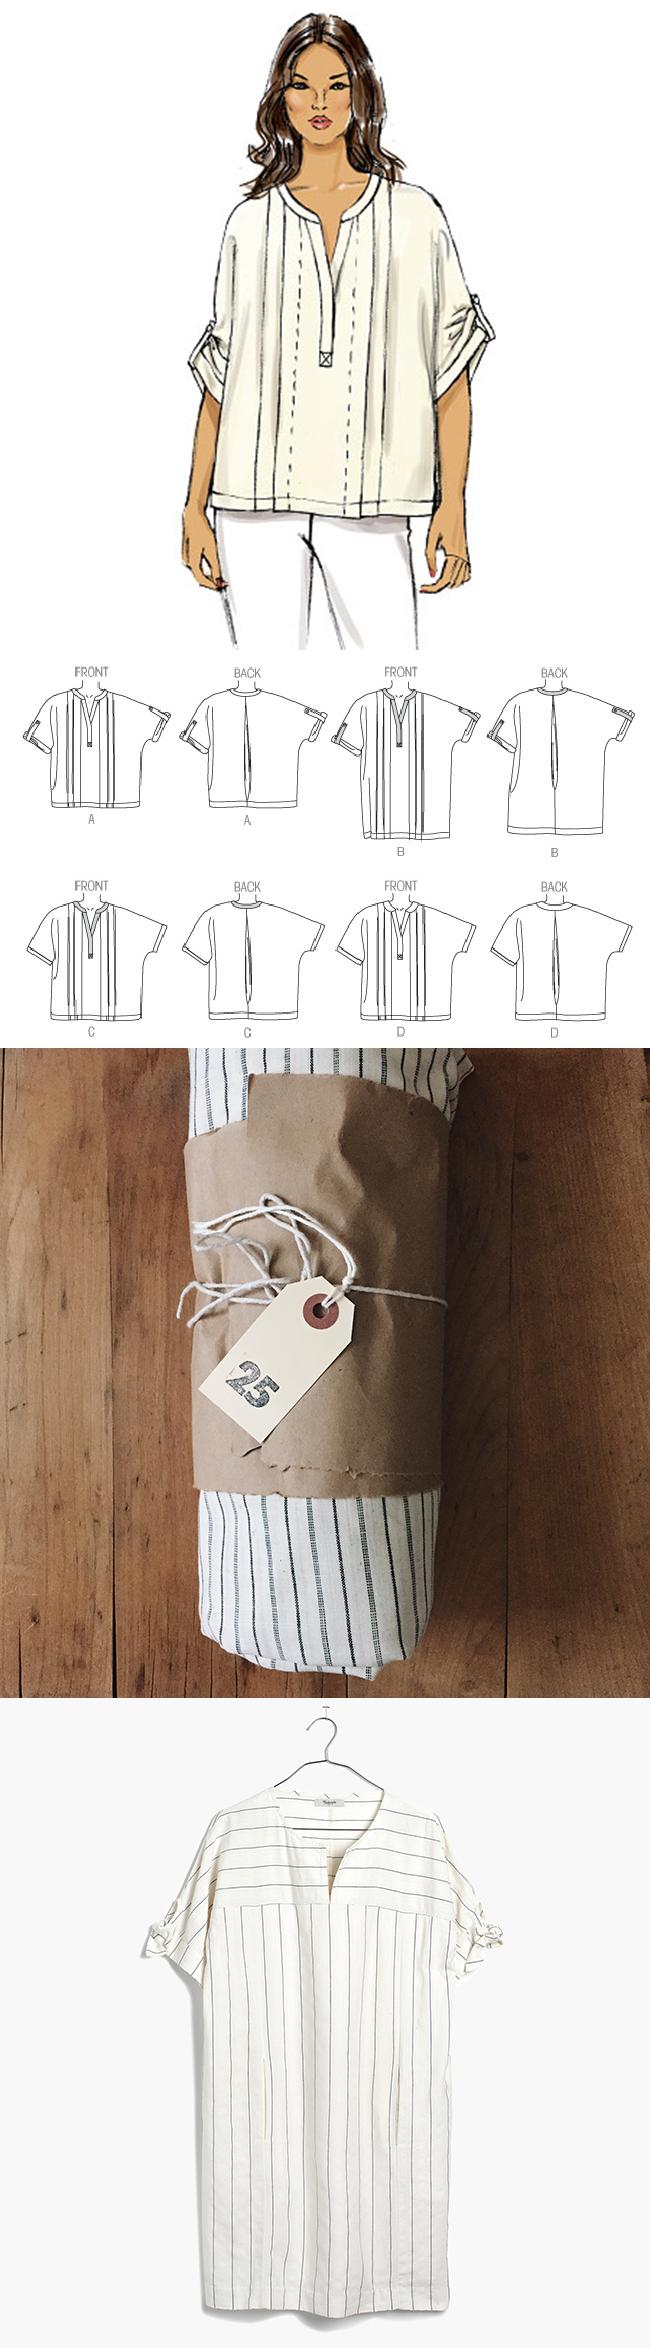 Idea Log: The pinstripe dress